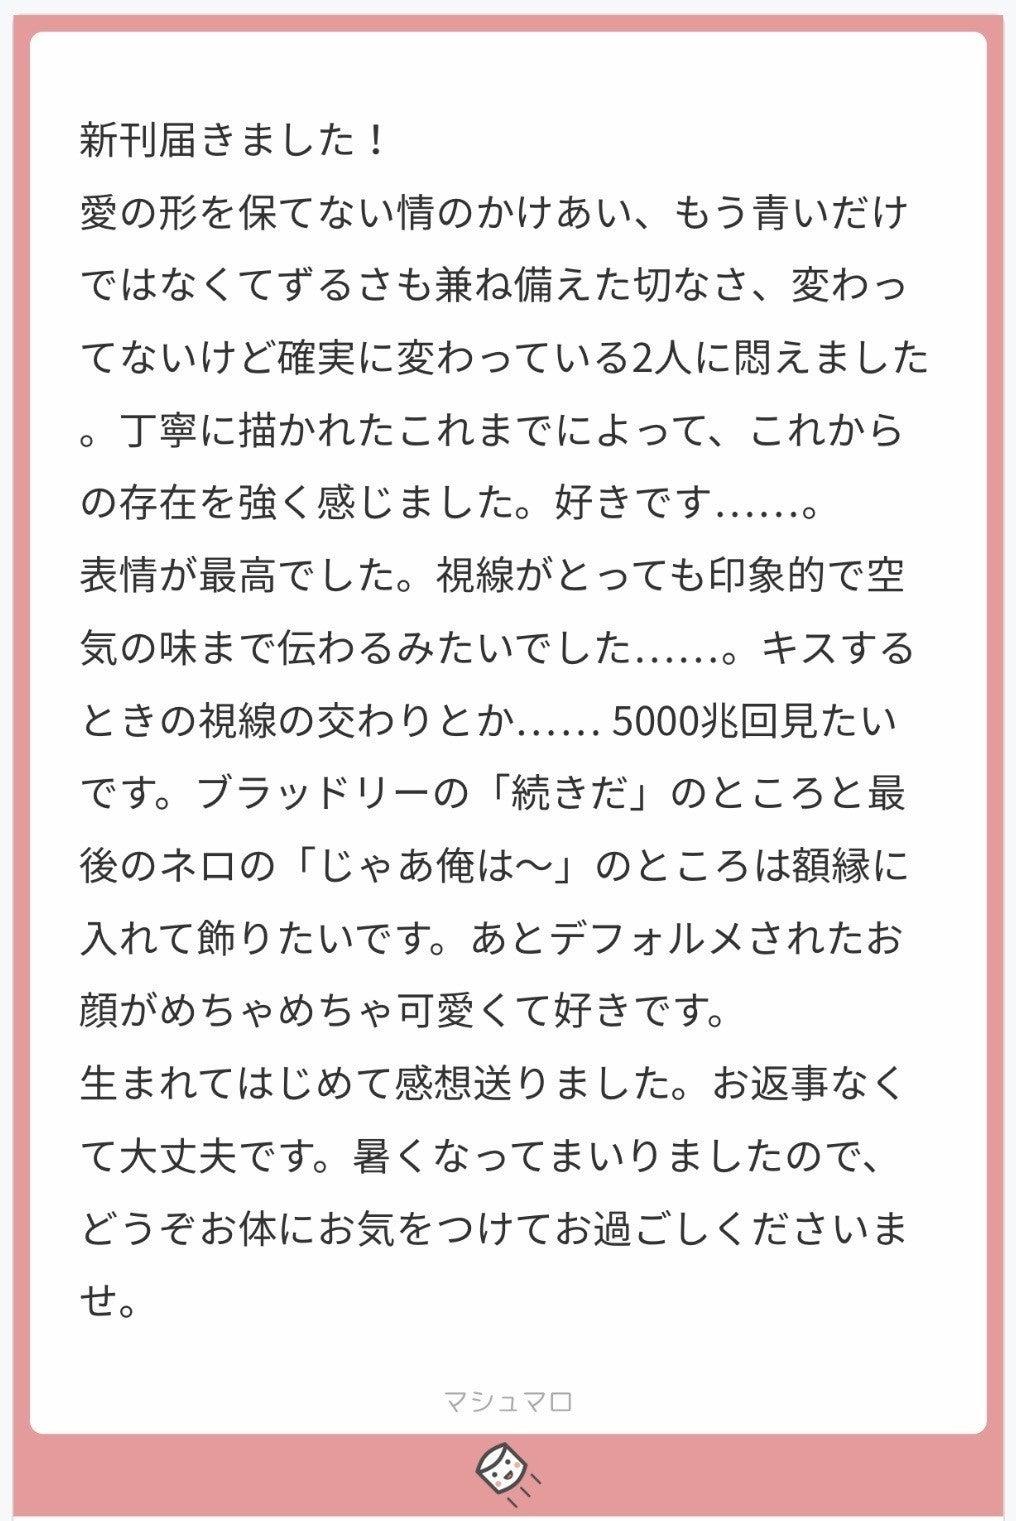 25時の一悶着:感想返信①(〜6/12)|芯|note